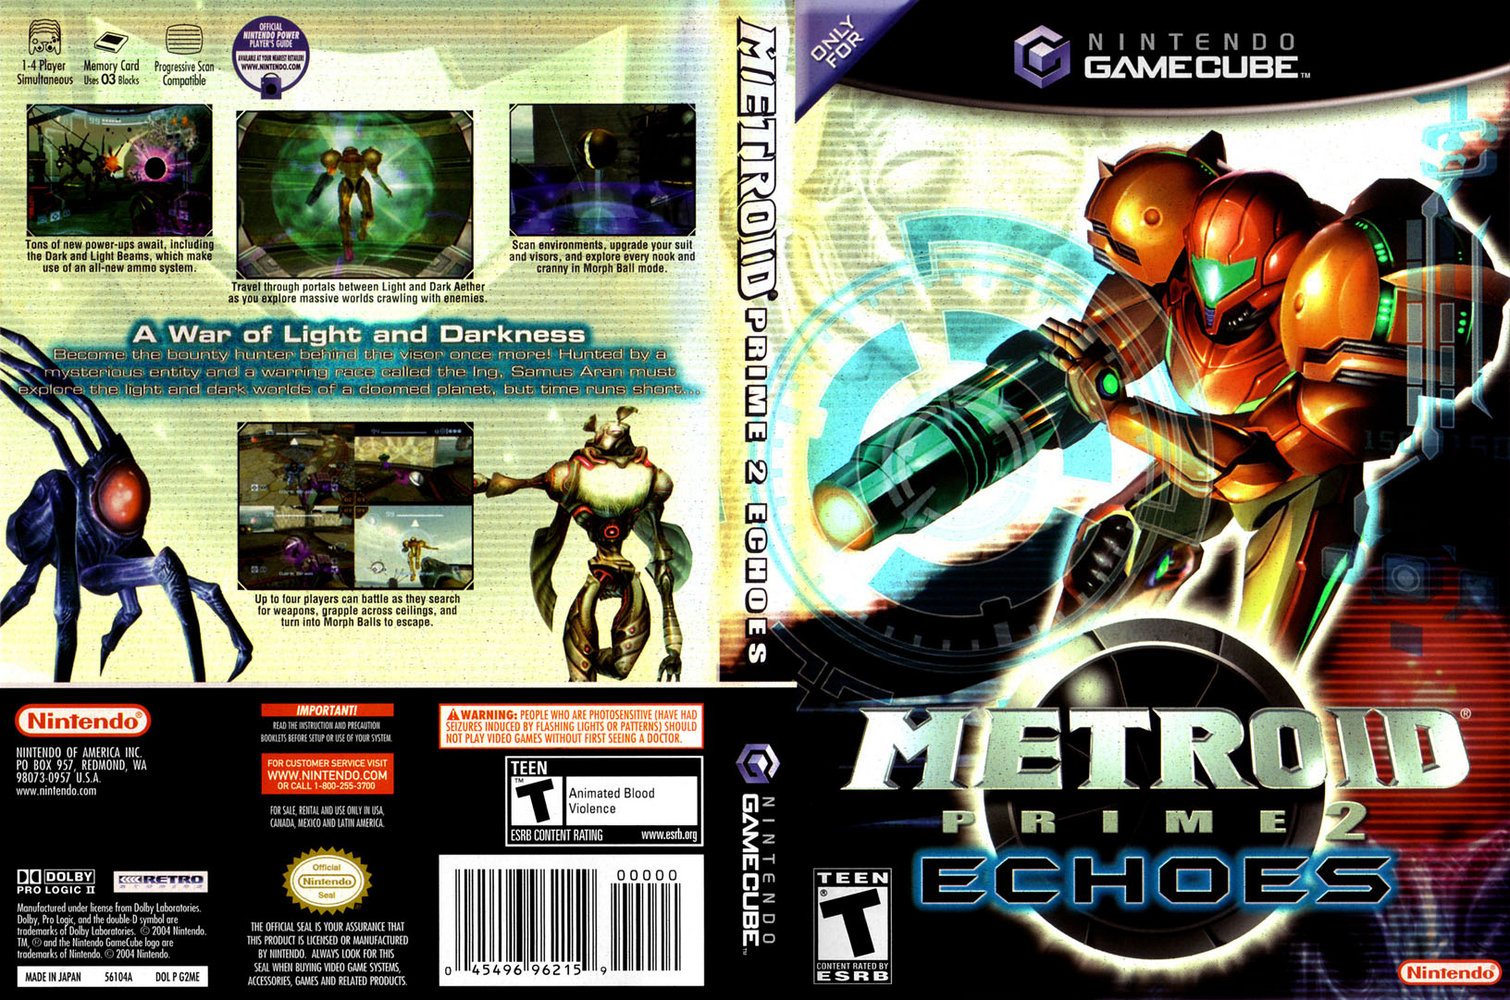 Games de GC convertidos para Wii U Metroid%20Prime%202%20Echoes